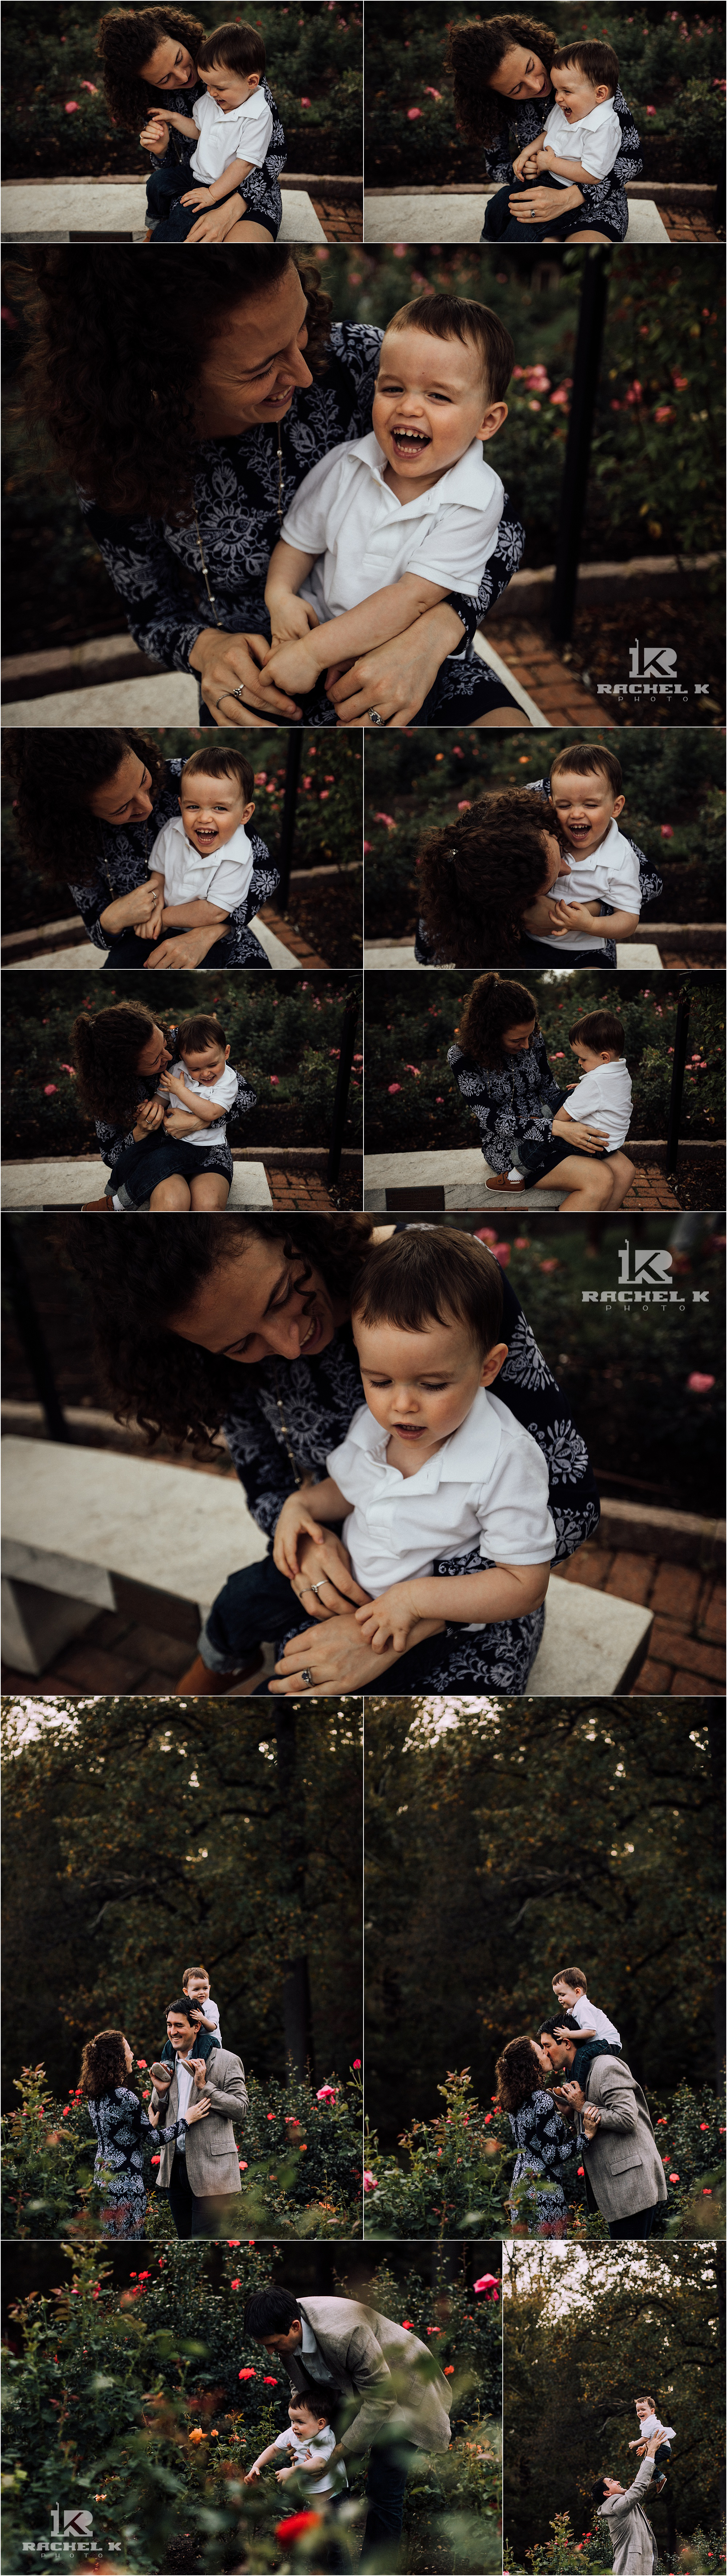 Fairfax Virginia family session with little boy by Rachel K Photo